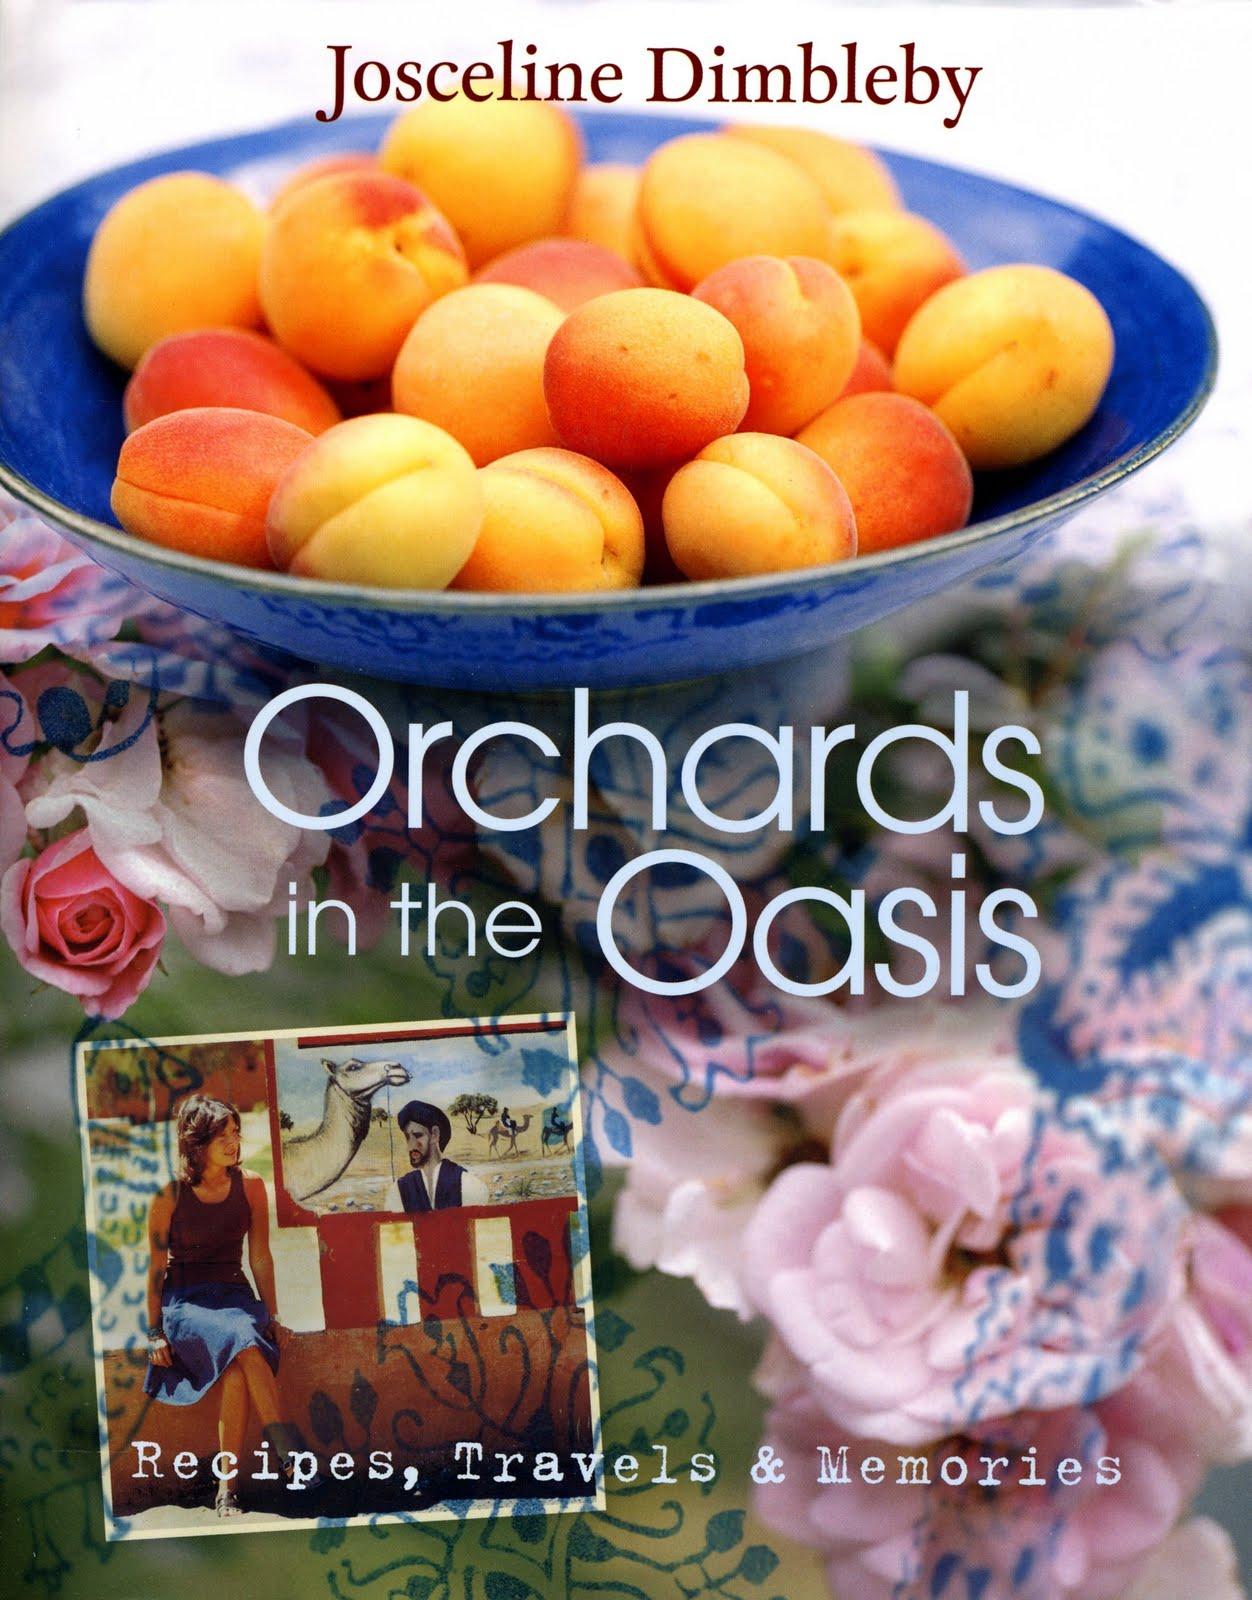 Orchards in the Oasis - Josceline Dimbleby   Photography Jason Lowe